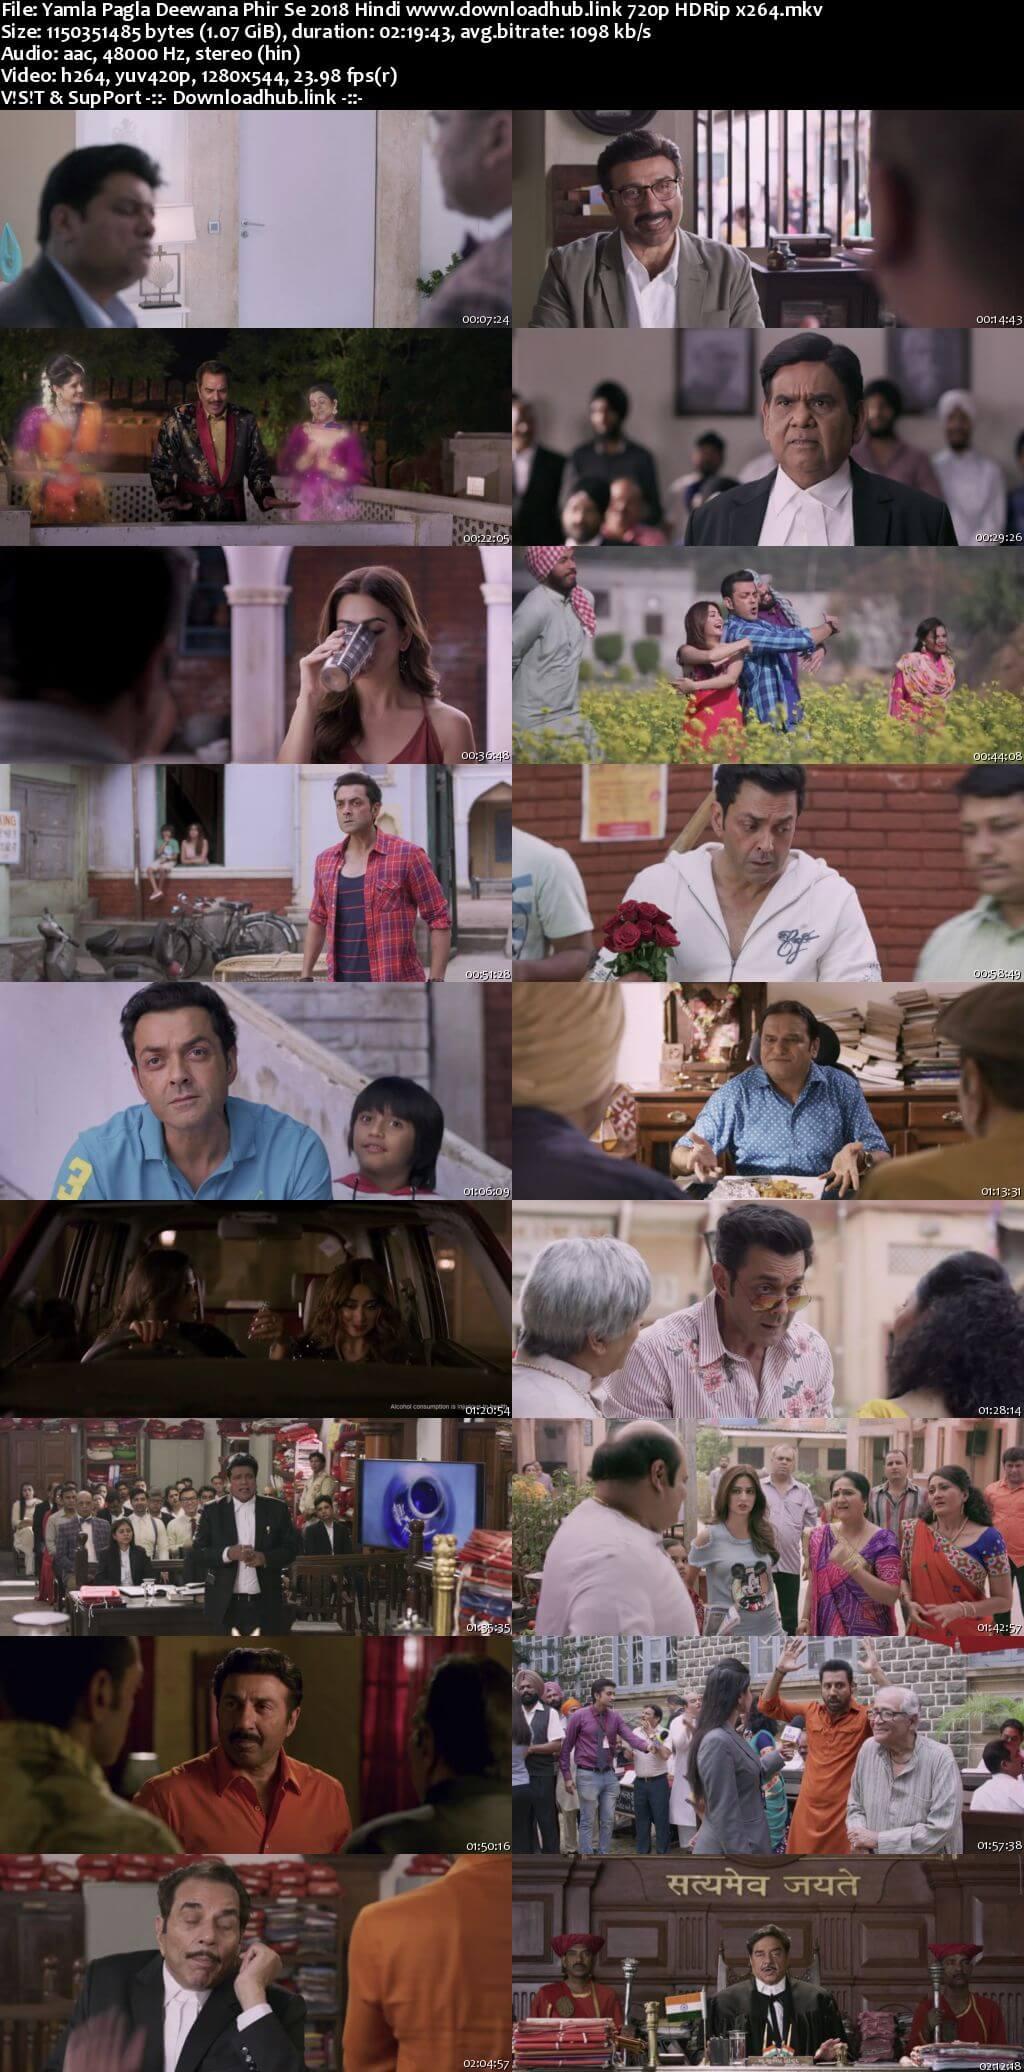 Yamla Pagla Deewana Phir Se 2018 Hindi 720p HDRip x264